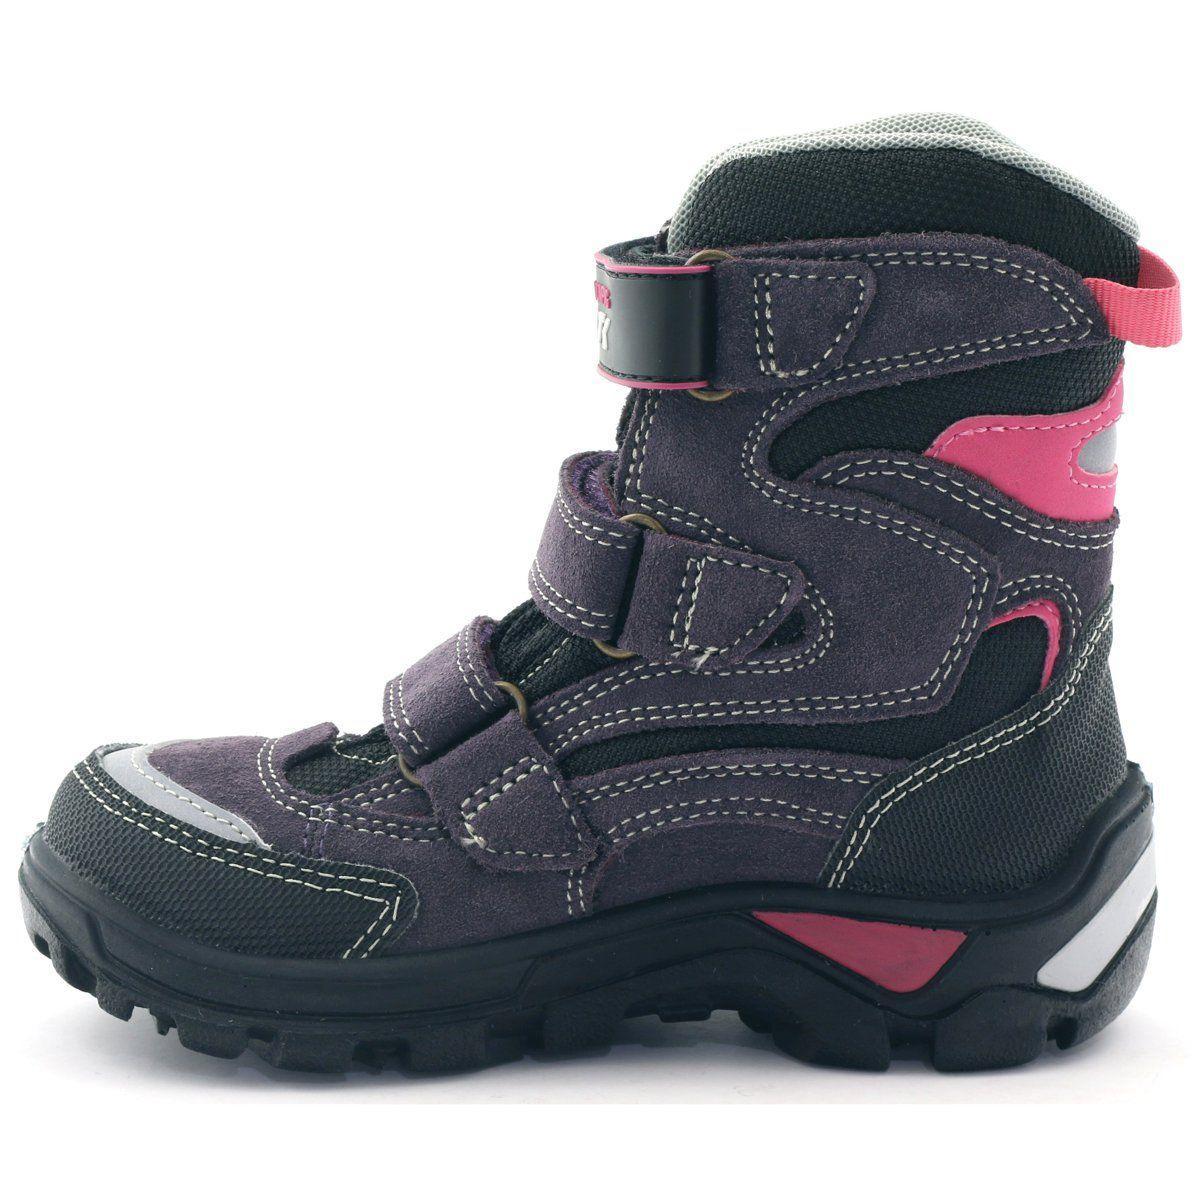 Trzewiki Dziewczece Z Membrana Bartek 94672 Czarne Fioletowe Rozowe Winter Boot Shoes Boots